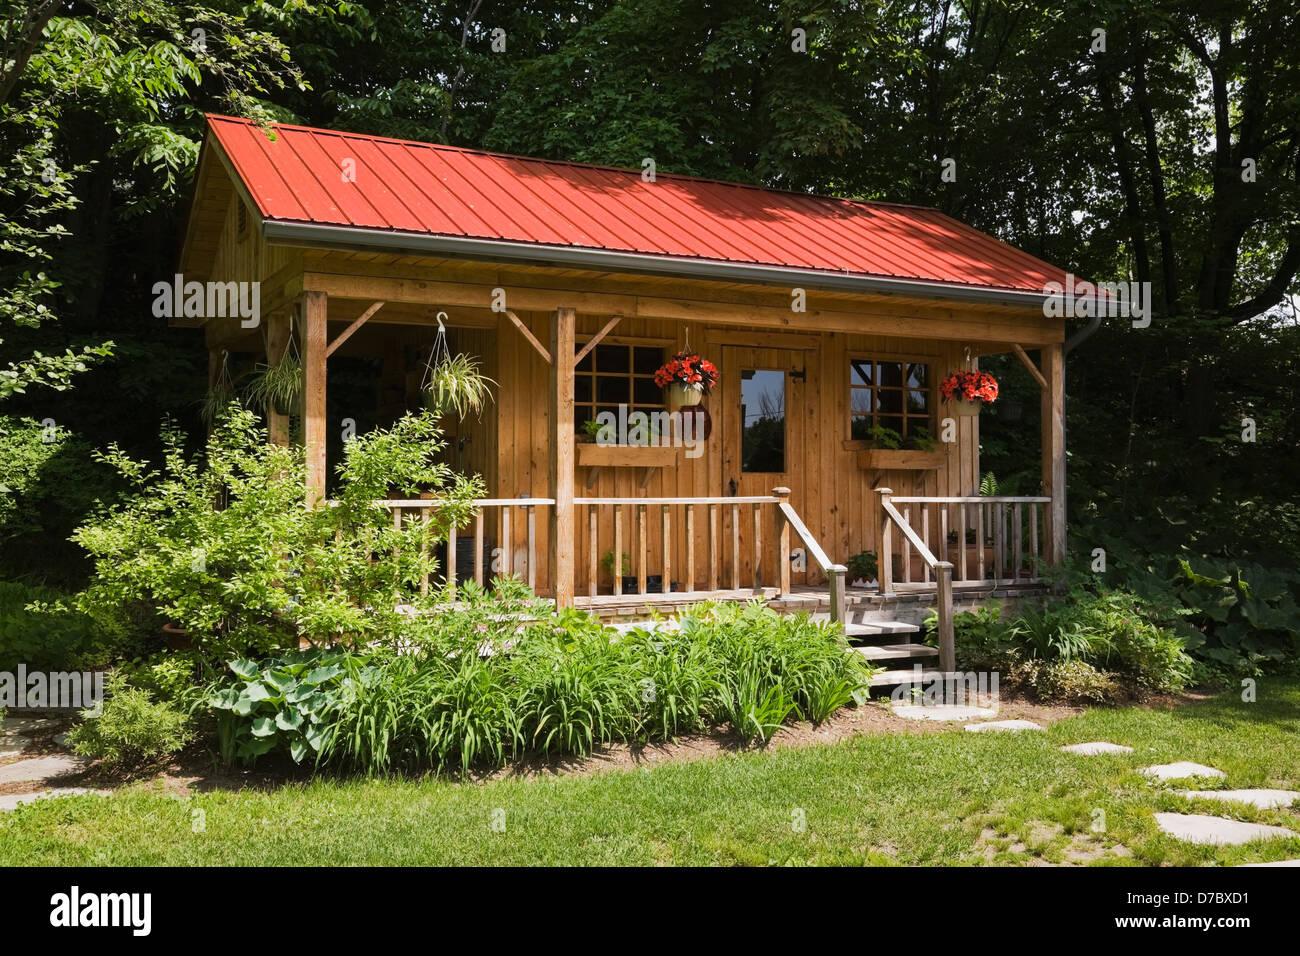 Workshop And Storage Shed In A Residential Back Yard Garden;Quebec ...